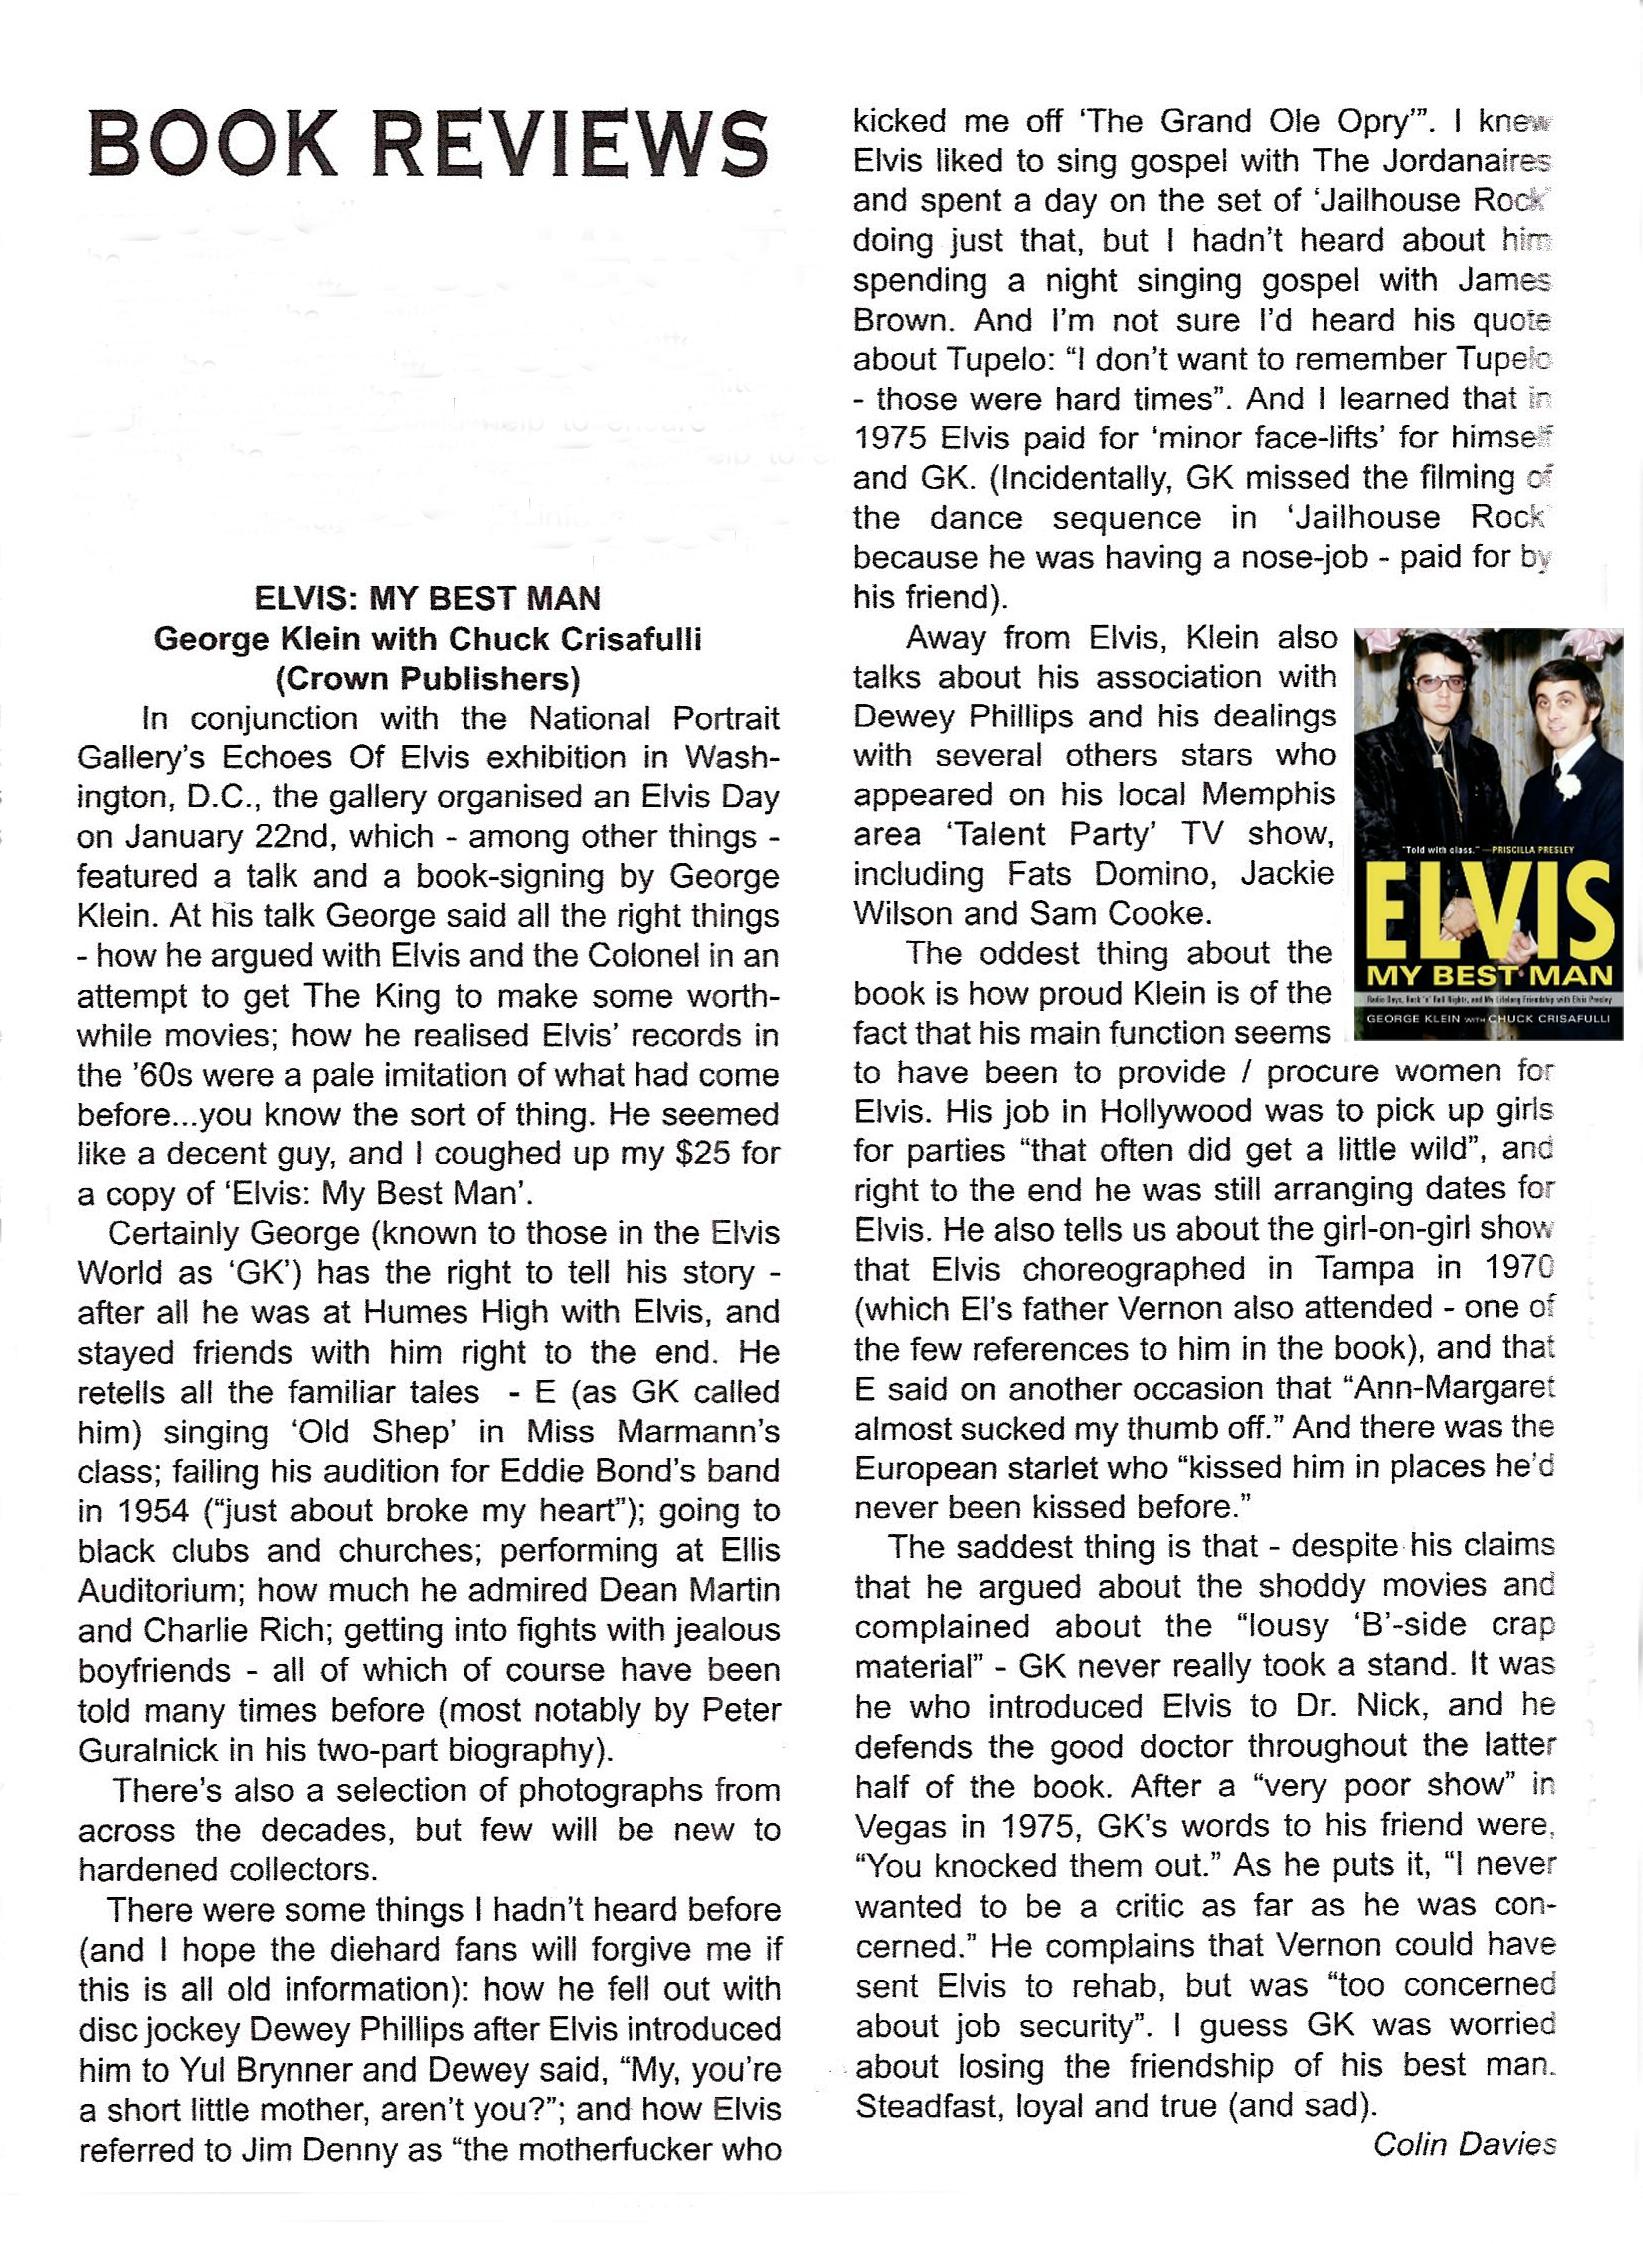 Read the magazine article